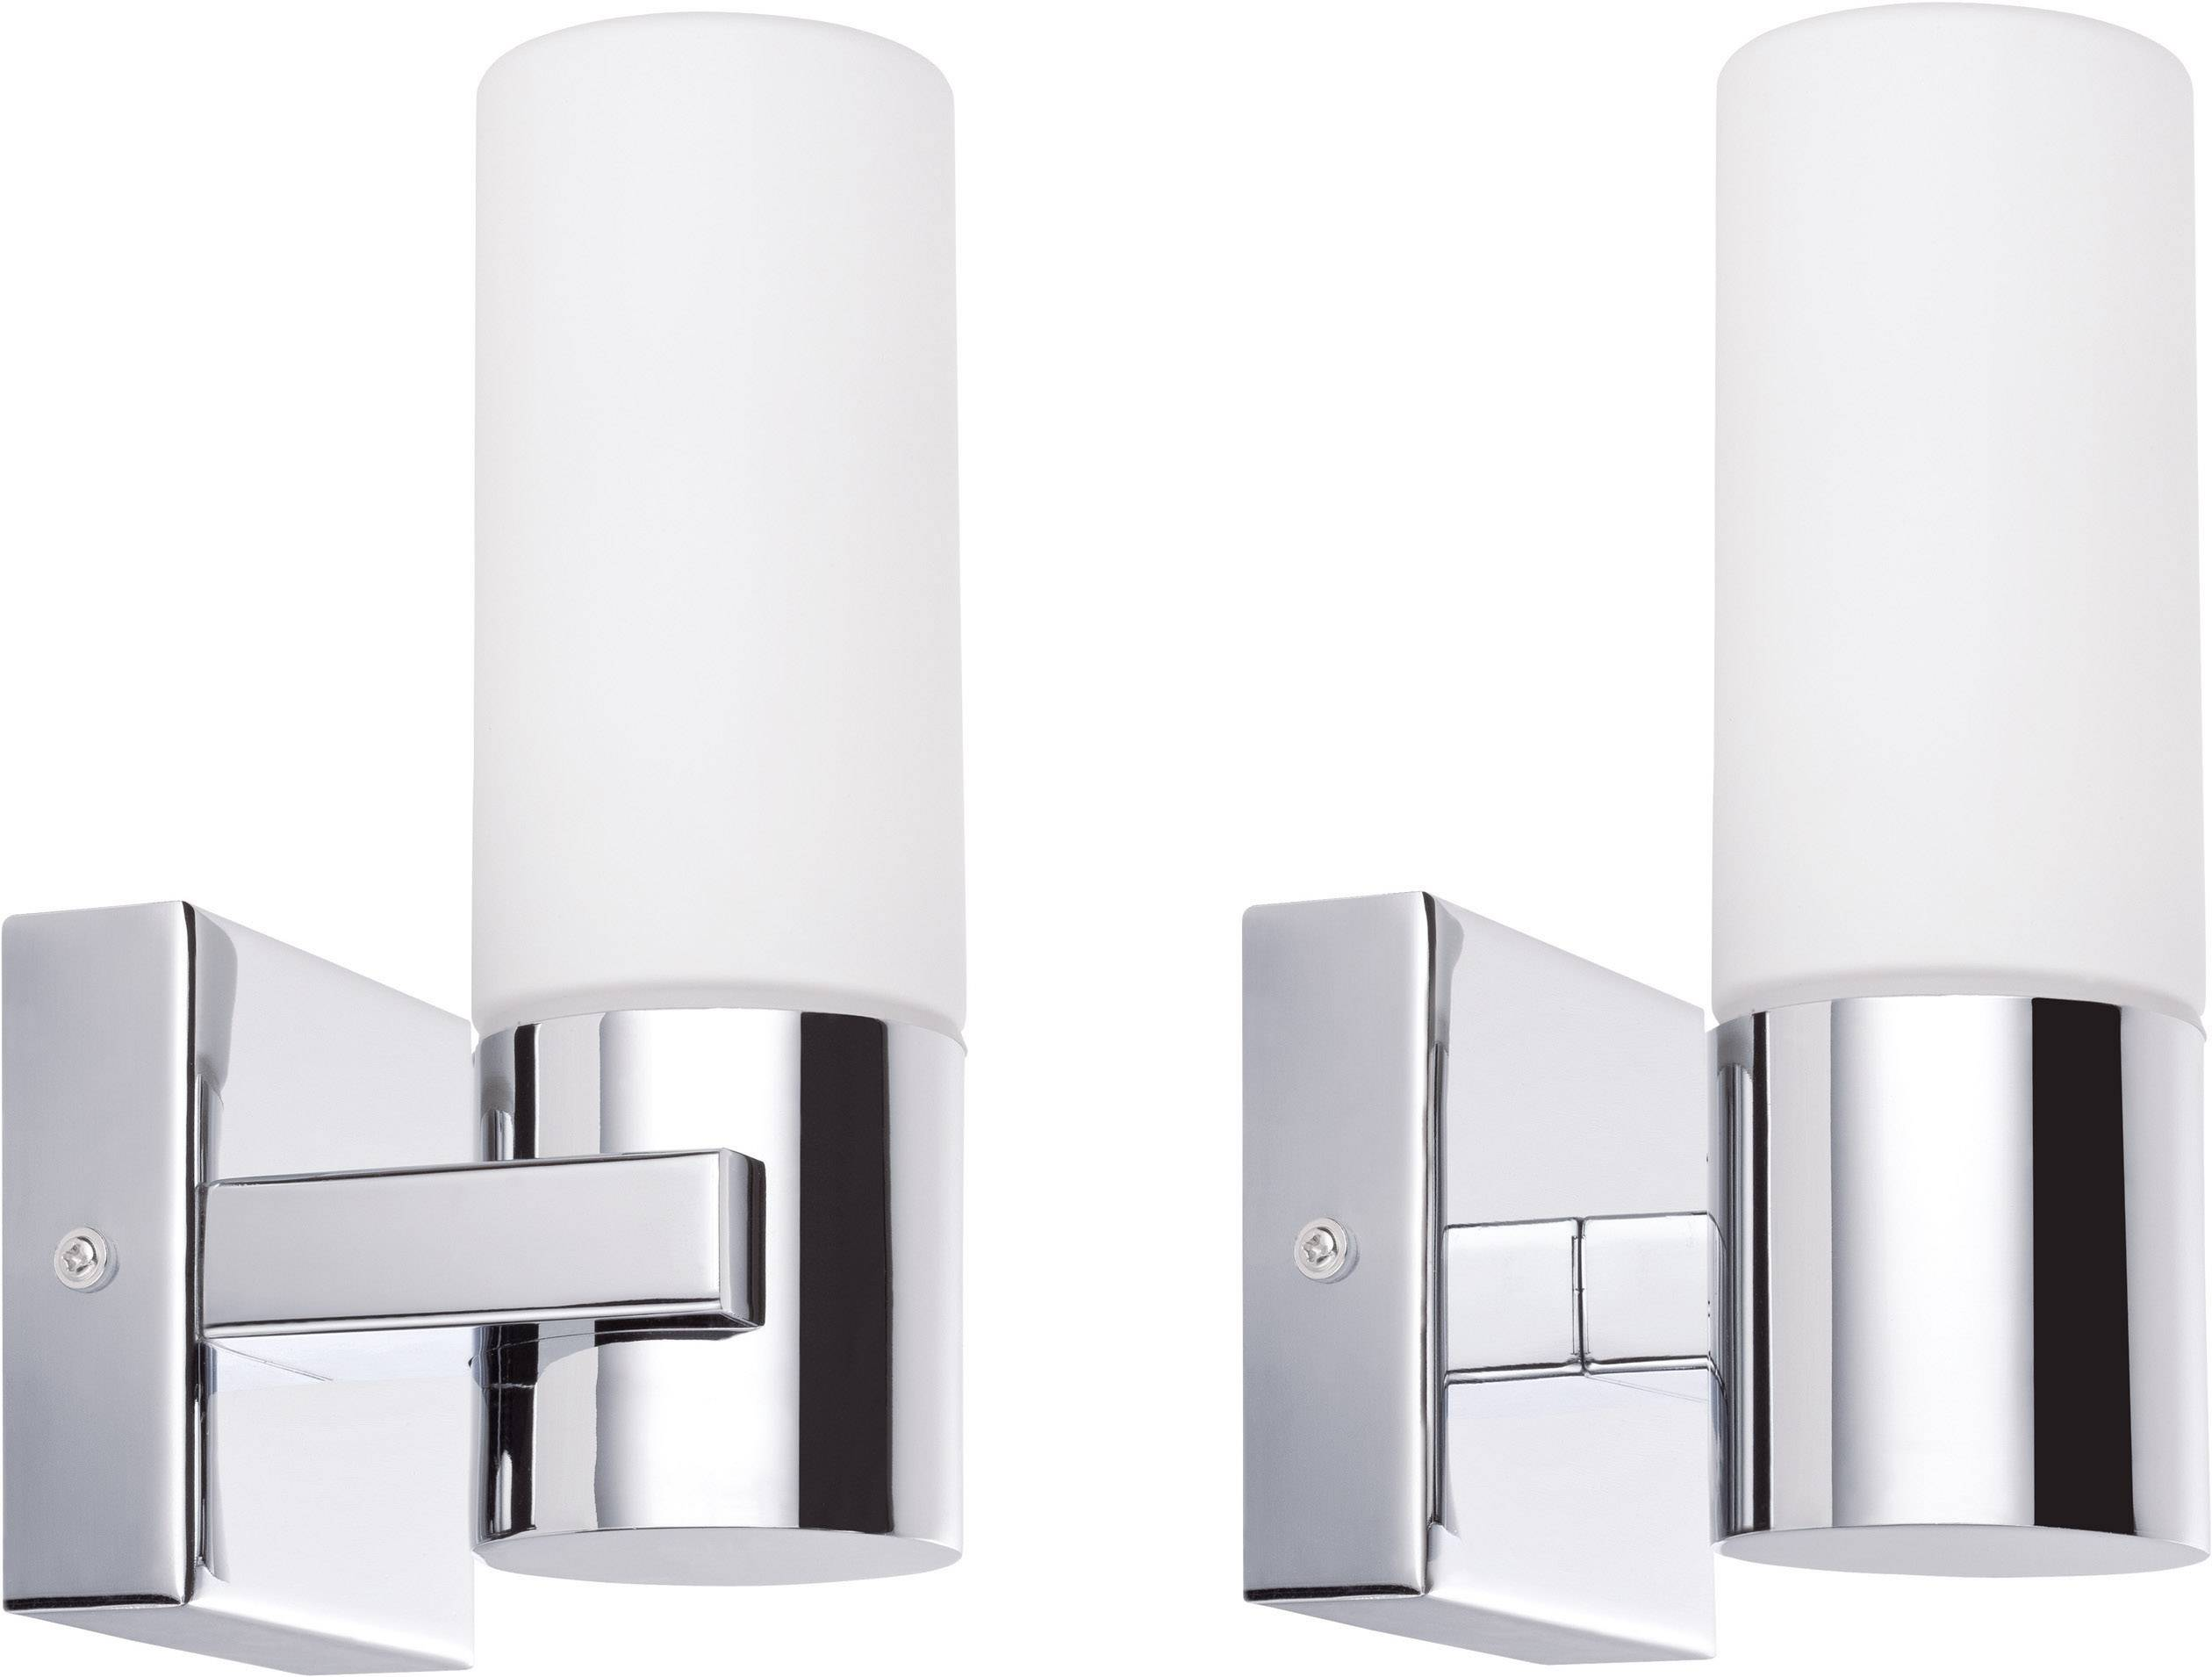 Badkamer Wandlamp Chroom : Badkamer wandlamp halogeen spaarlamp e14 40 w paulmann gemini 70354